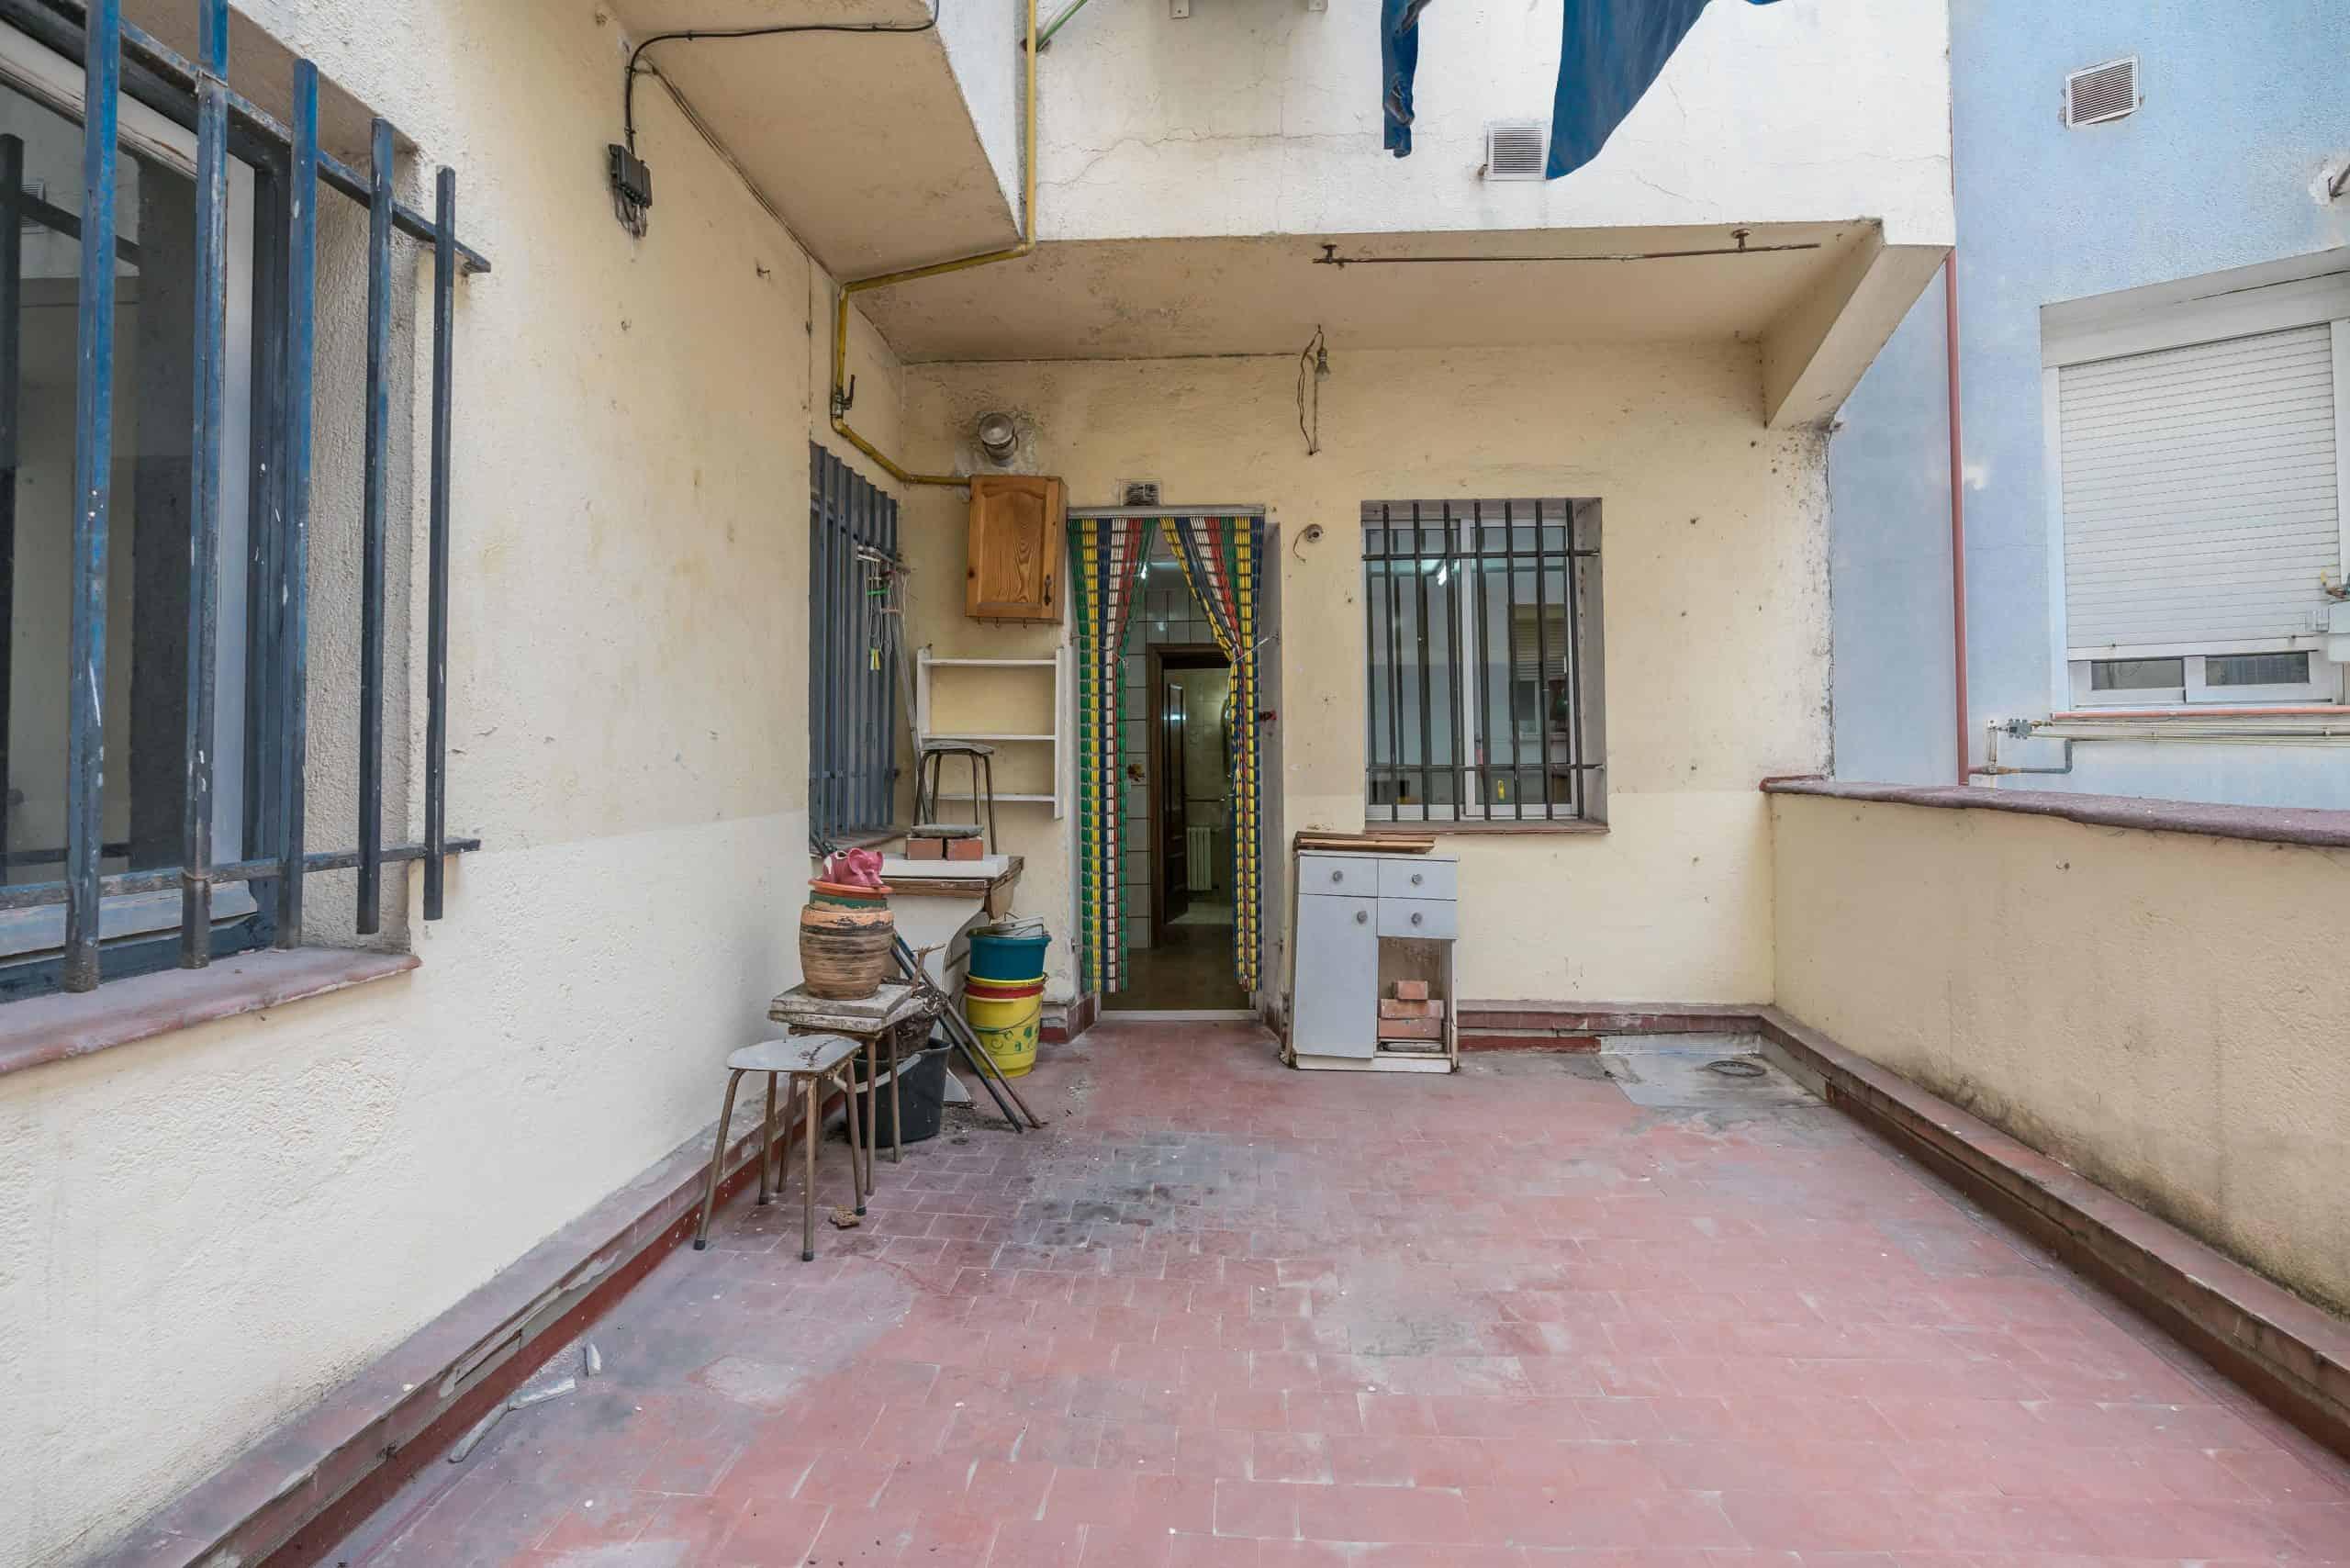 Agencia Inmobiliaria de Madrid-FUTUROCASA-Zona ARGANZUELA-LEGAZPI -calle Jaime Conquistador 27- Patio 5